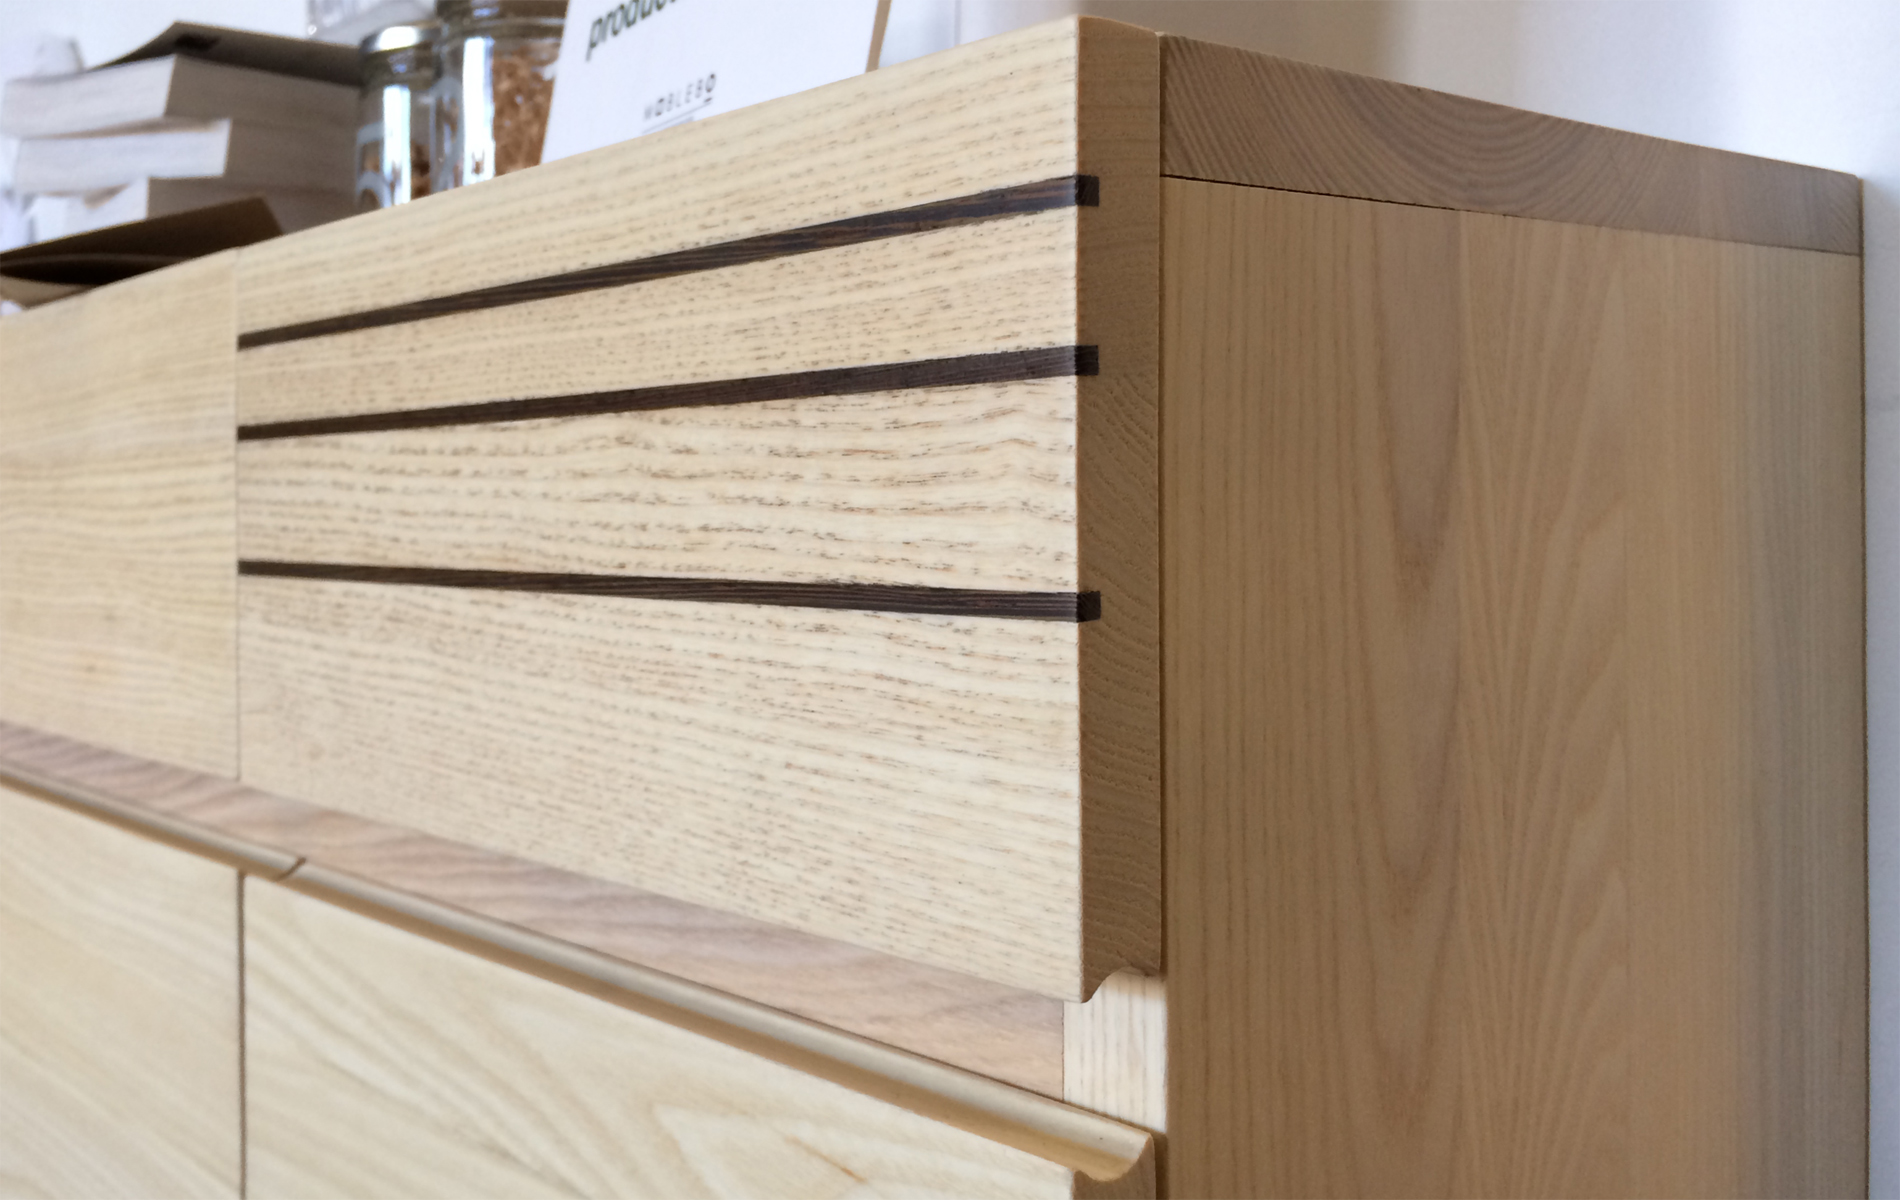 mueble madera maciza detalle cajón